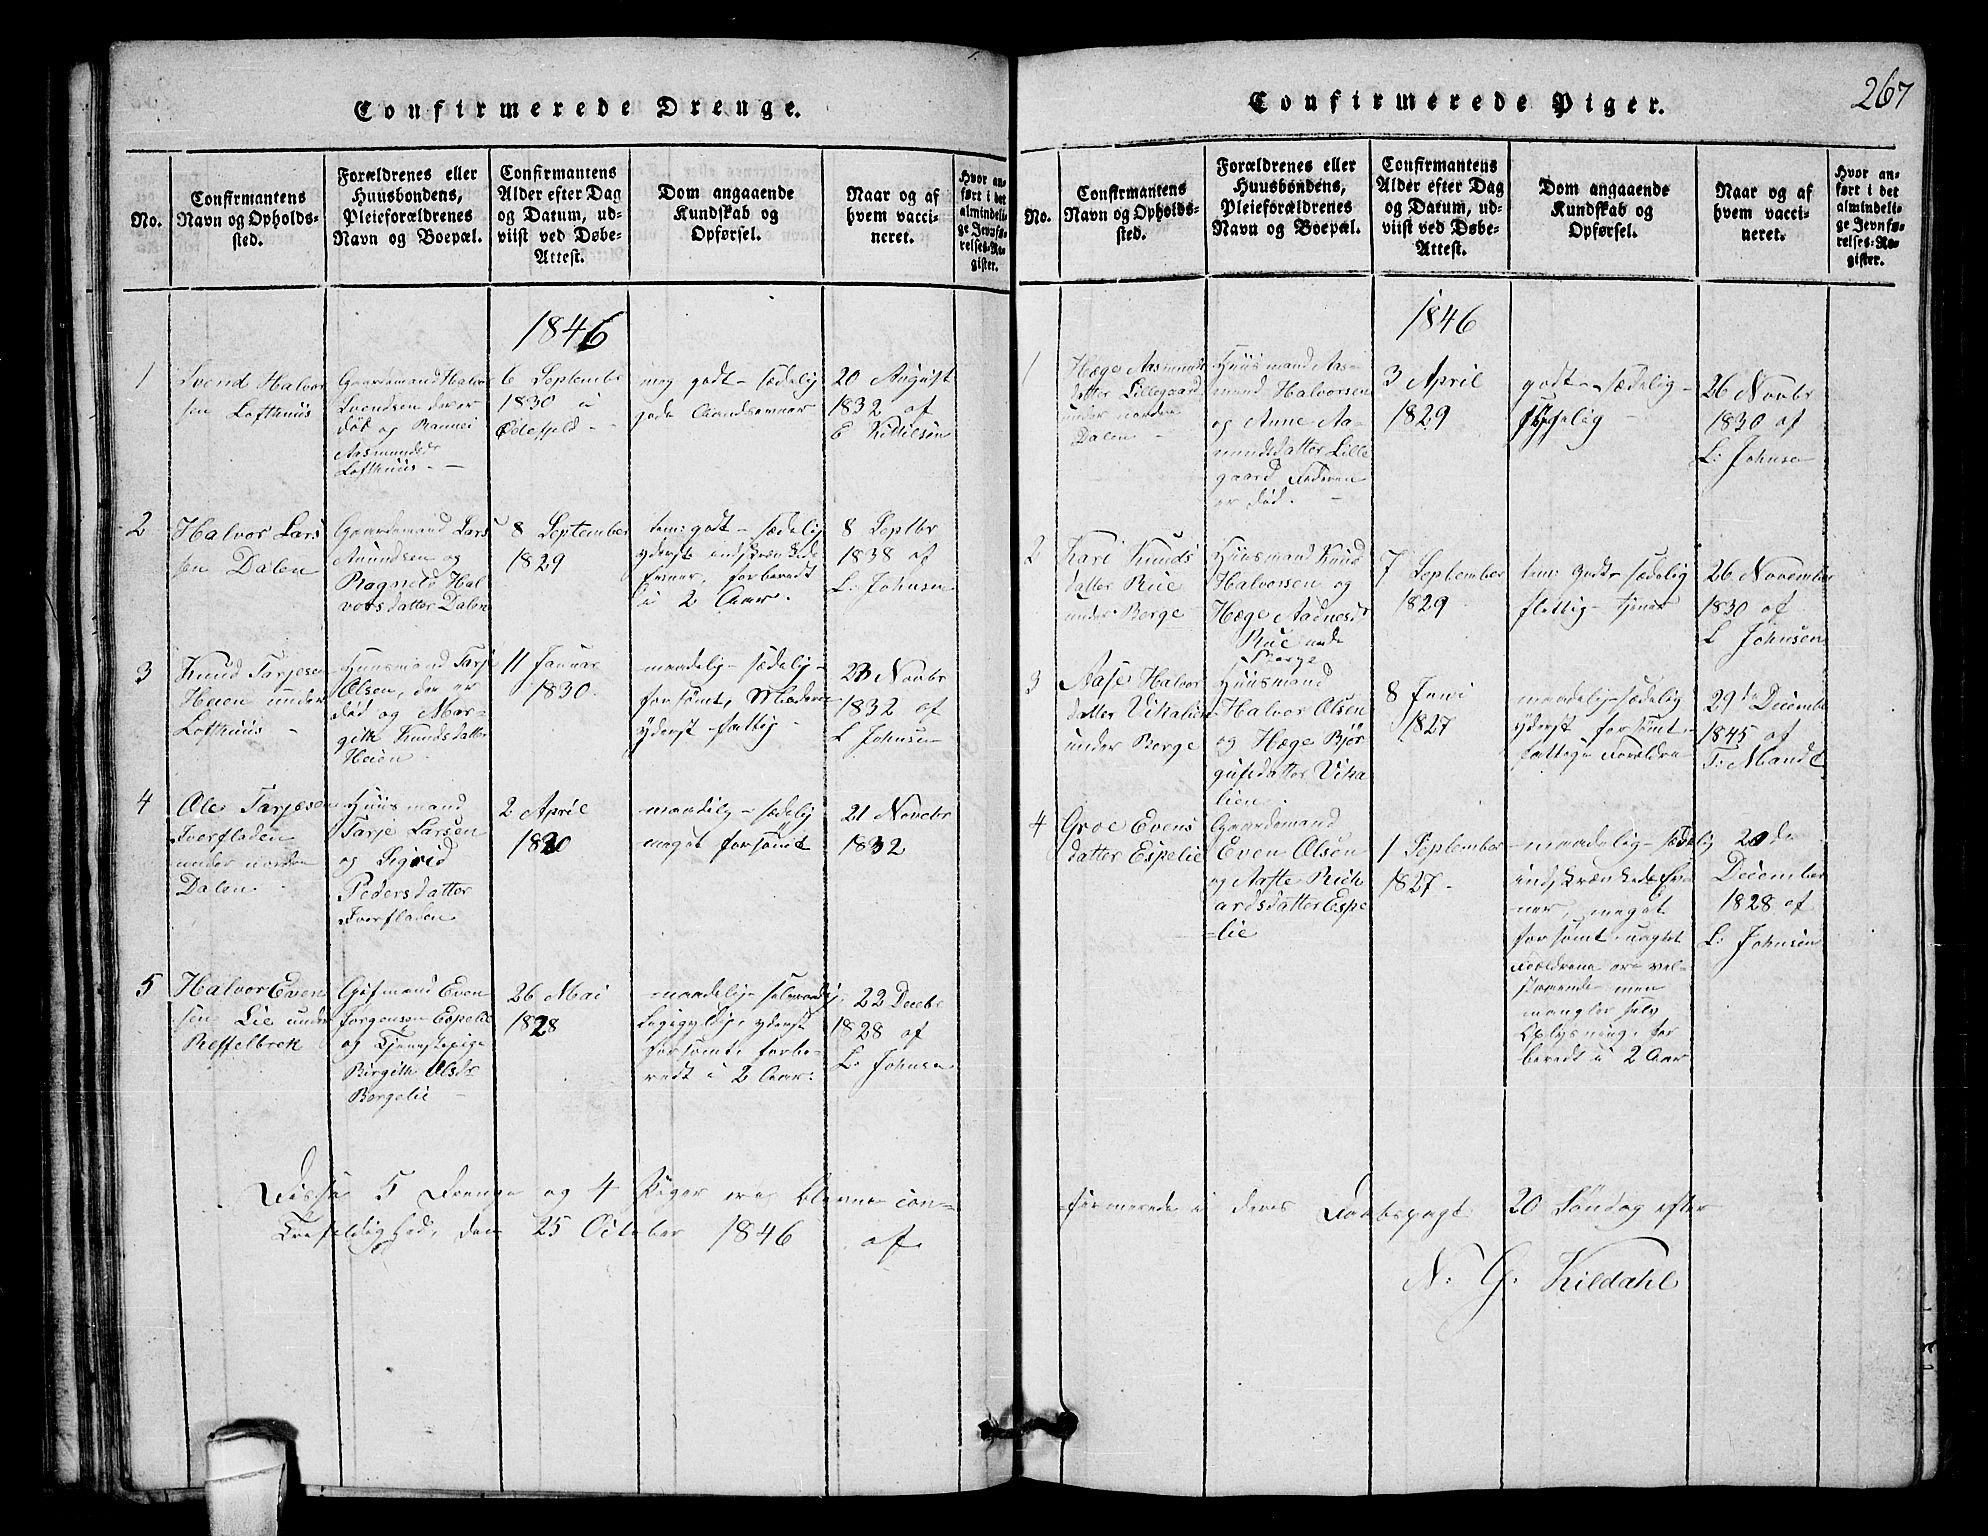 SAKO, Lårdal kirkebøker, G/Gb/L0001: Klokkerbok nr. II 1, 1815-1865, s. 267